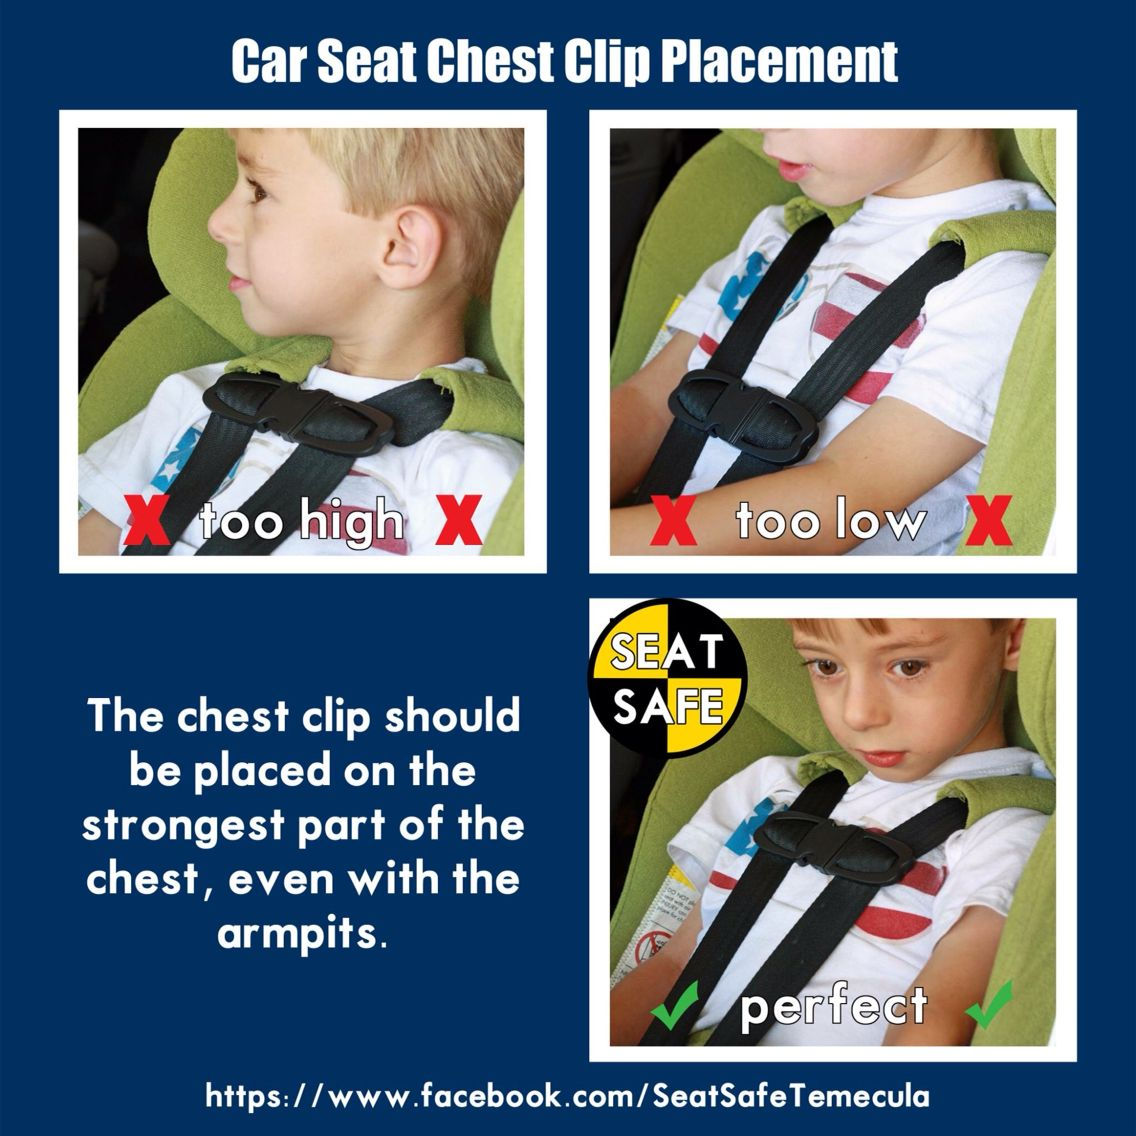 Car Seat Chest Clip Placement Facebook